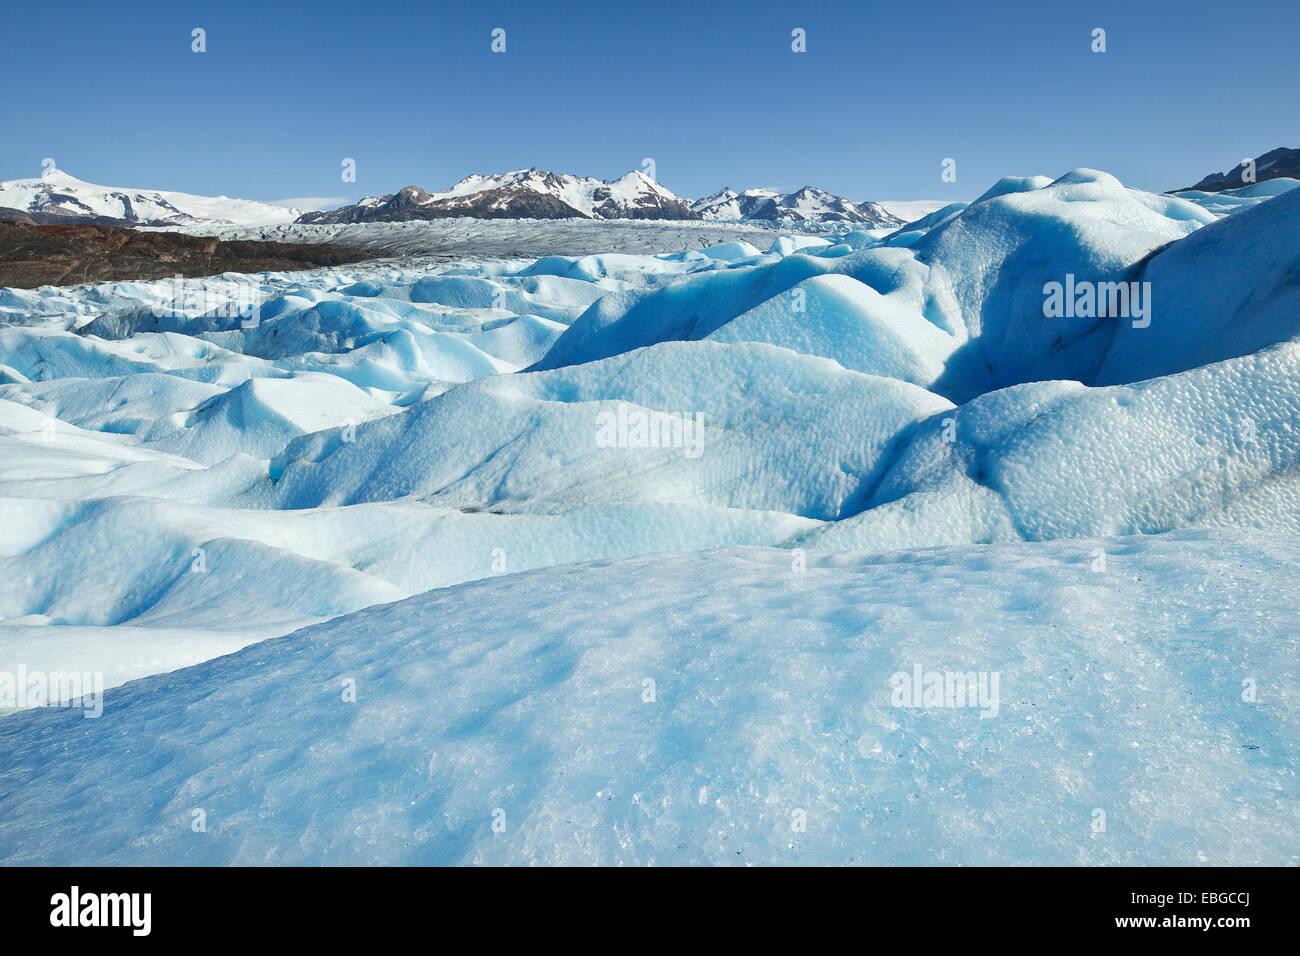 Grey Glacier, glacier tongue, Torres del Paine National Park, Chile - Stock Image